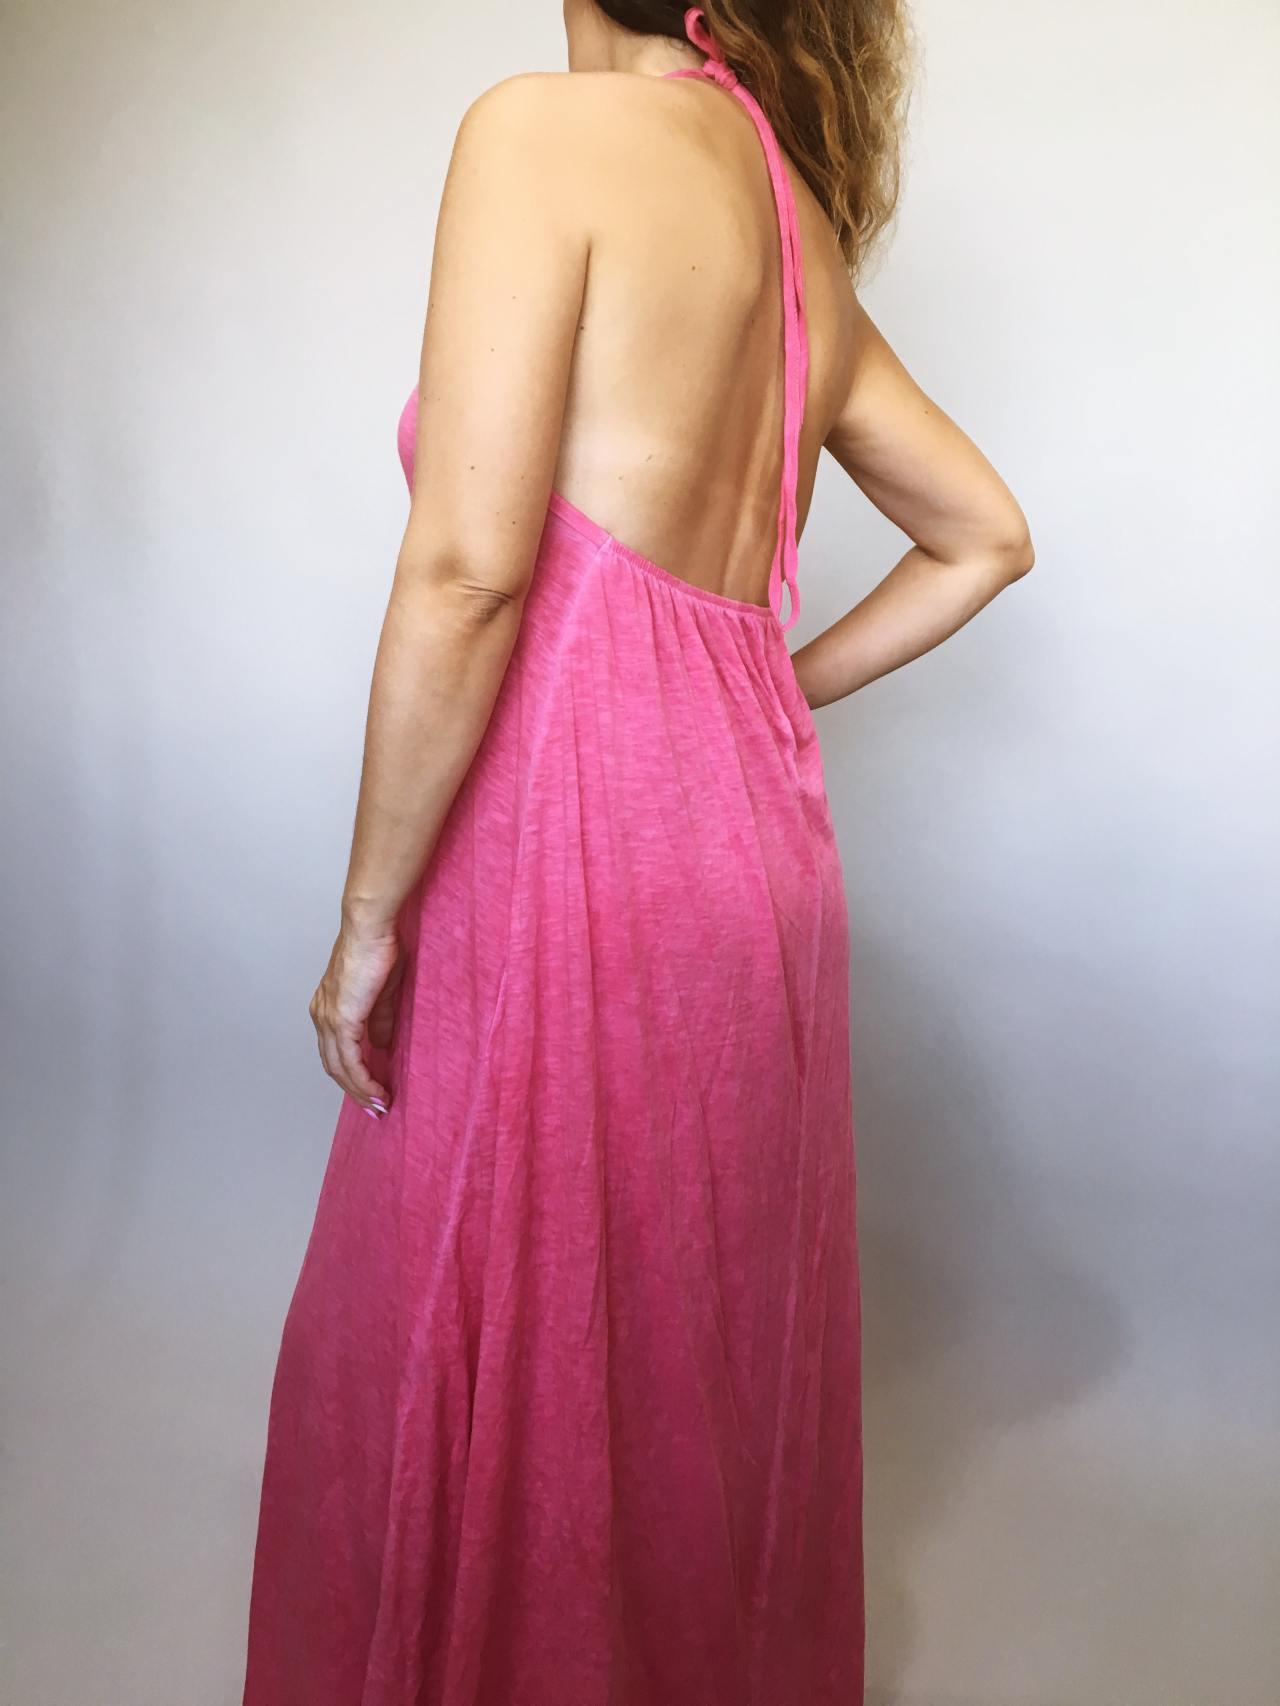 Šaty Sandy růžové 05